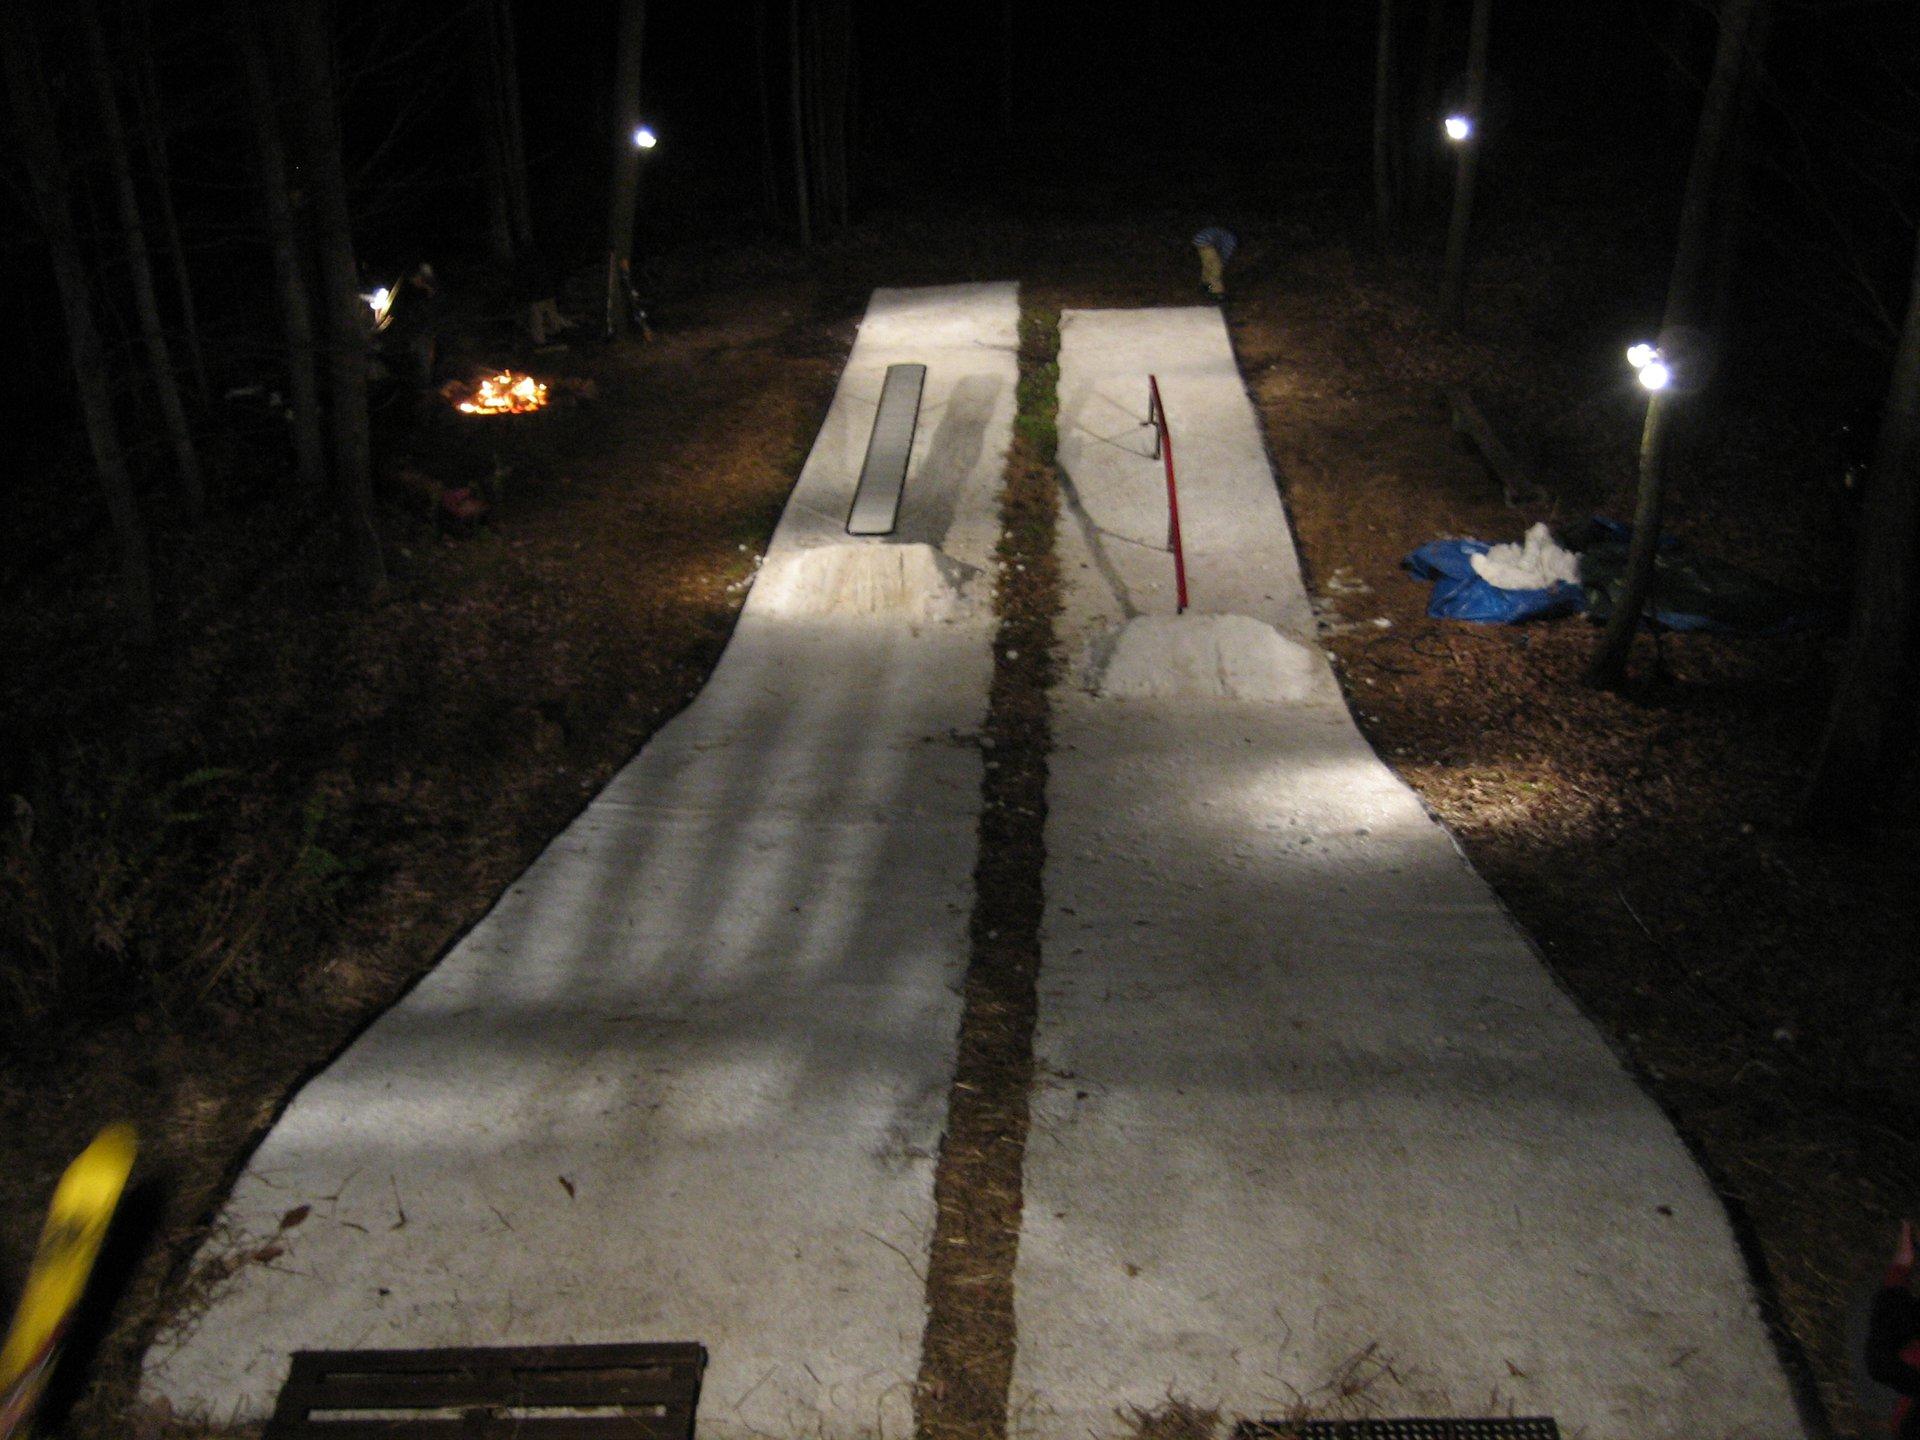 Park 1260 - Under the Lights 2009